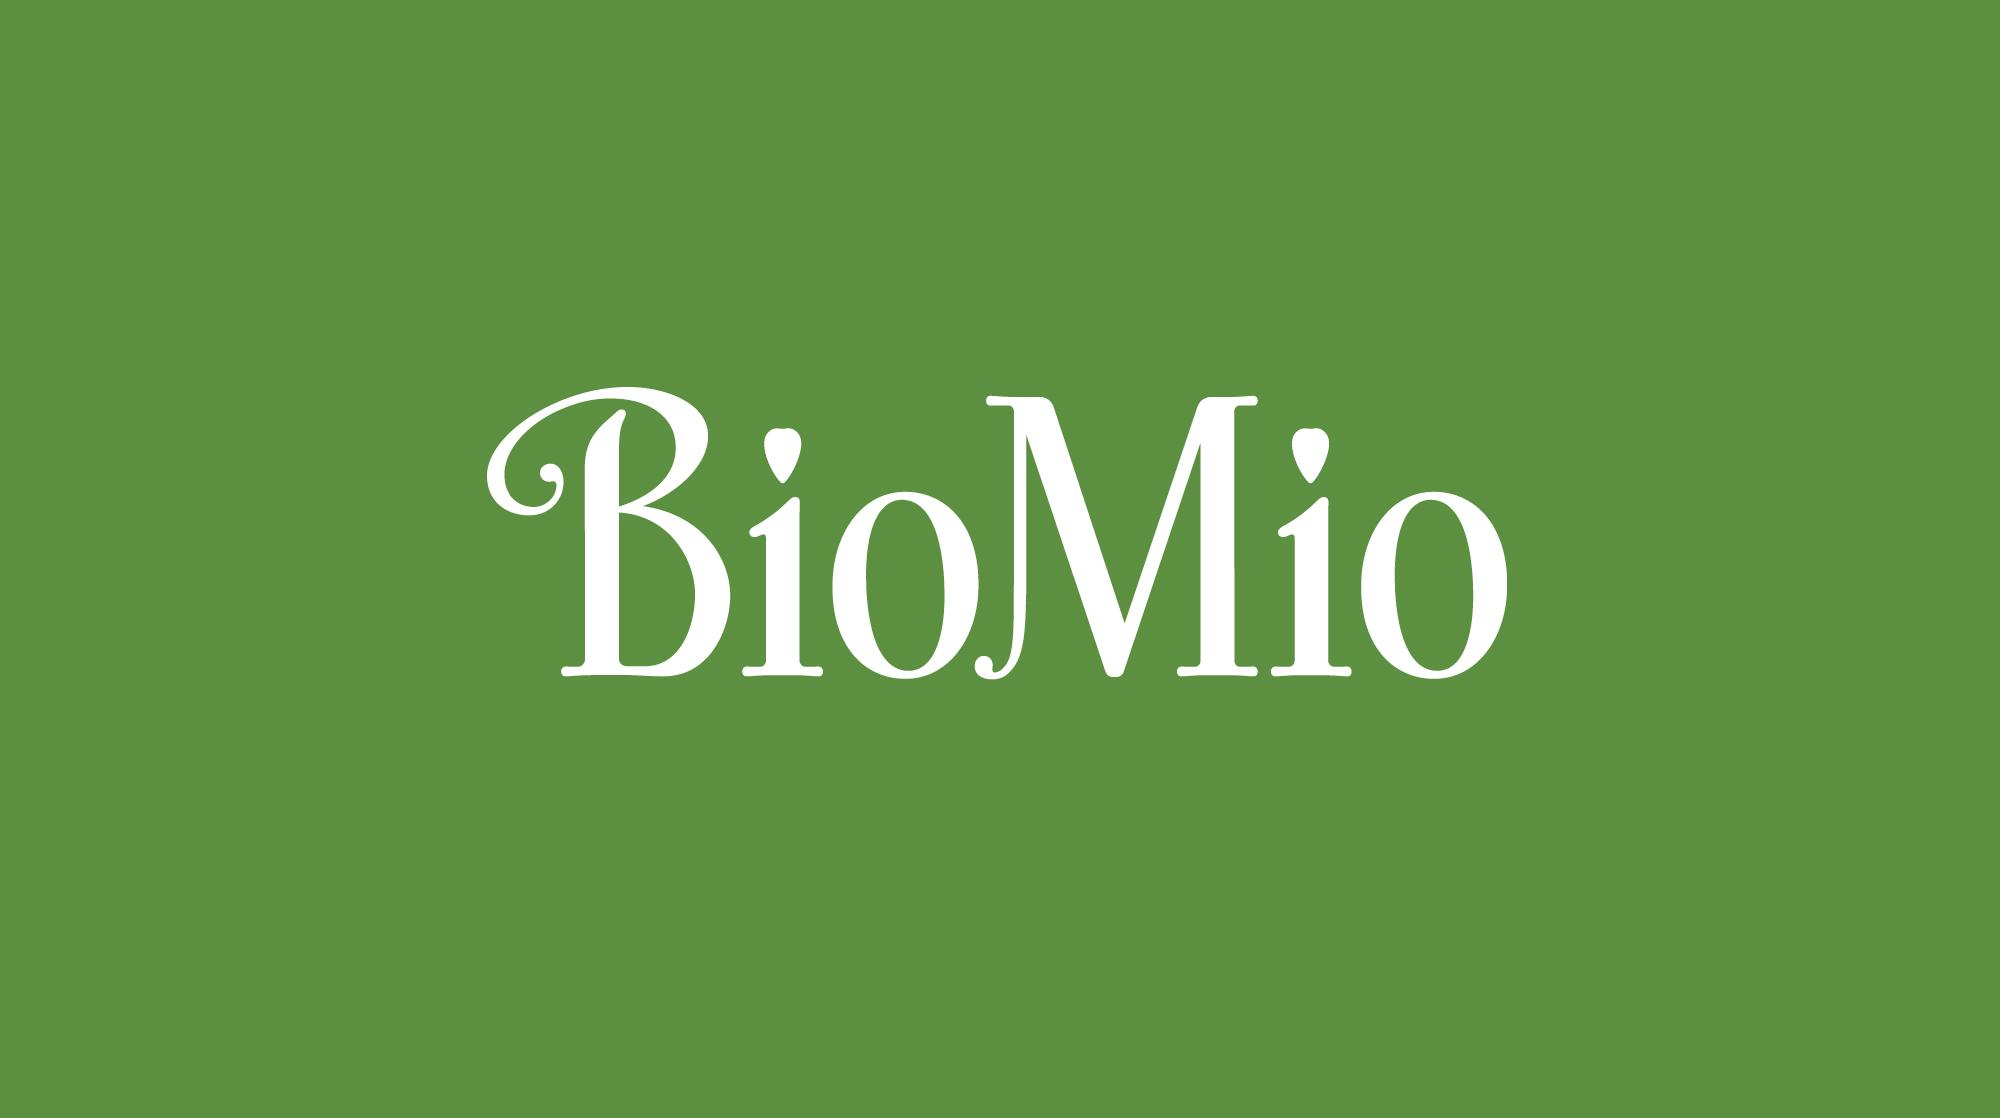 Justbenice-BioMio-logo.jpg